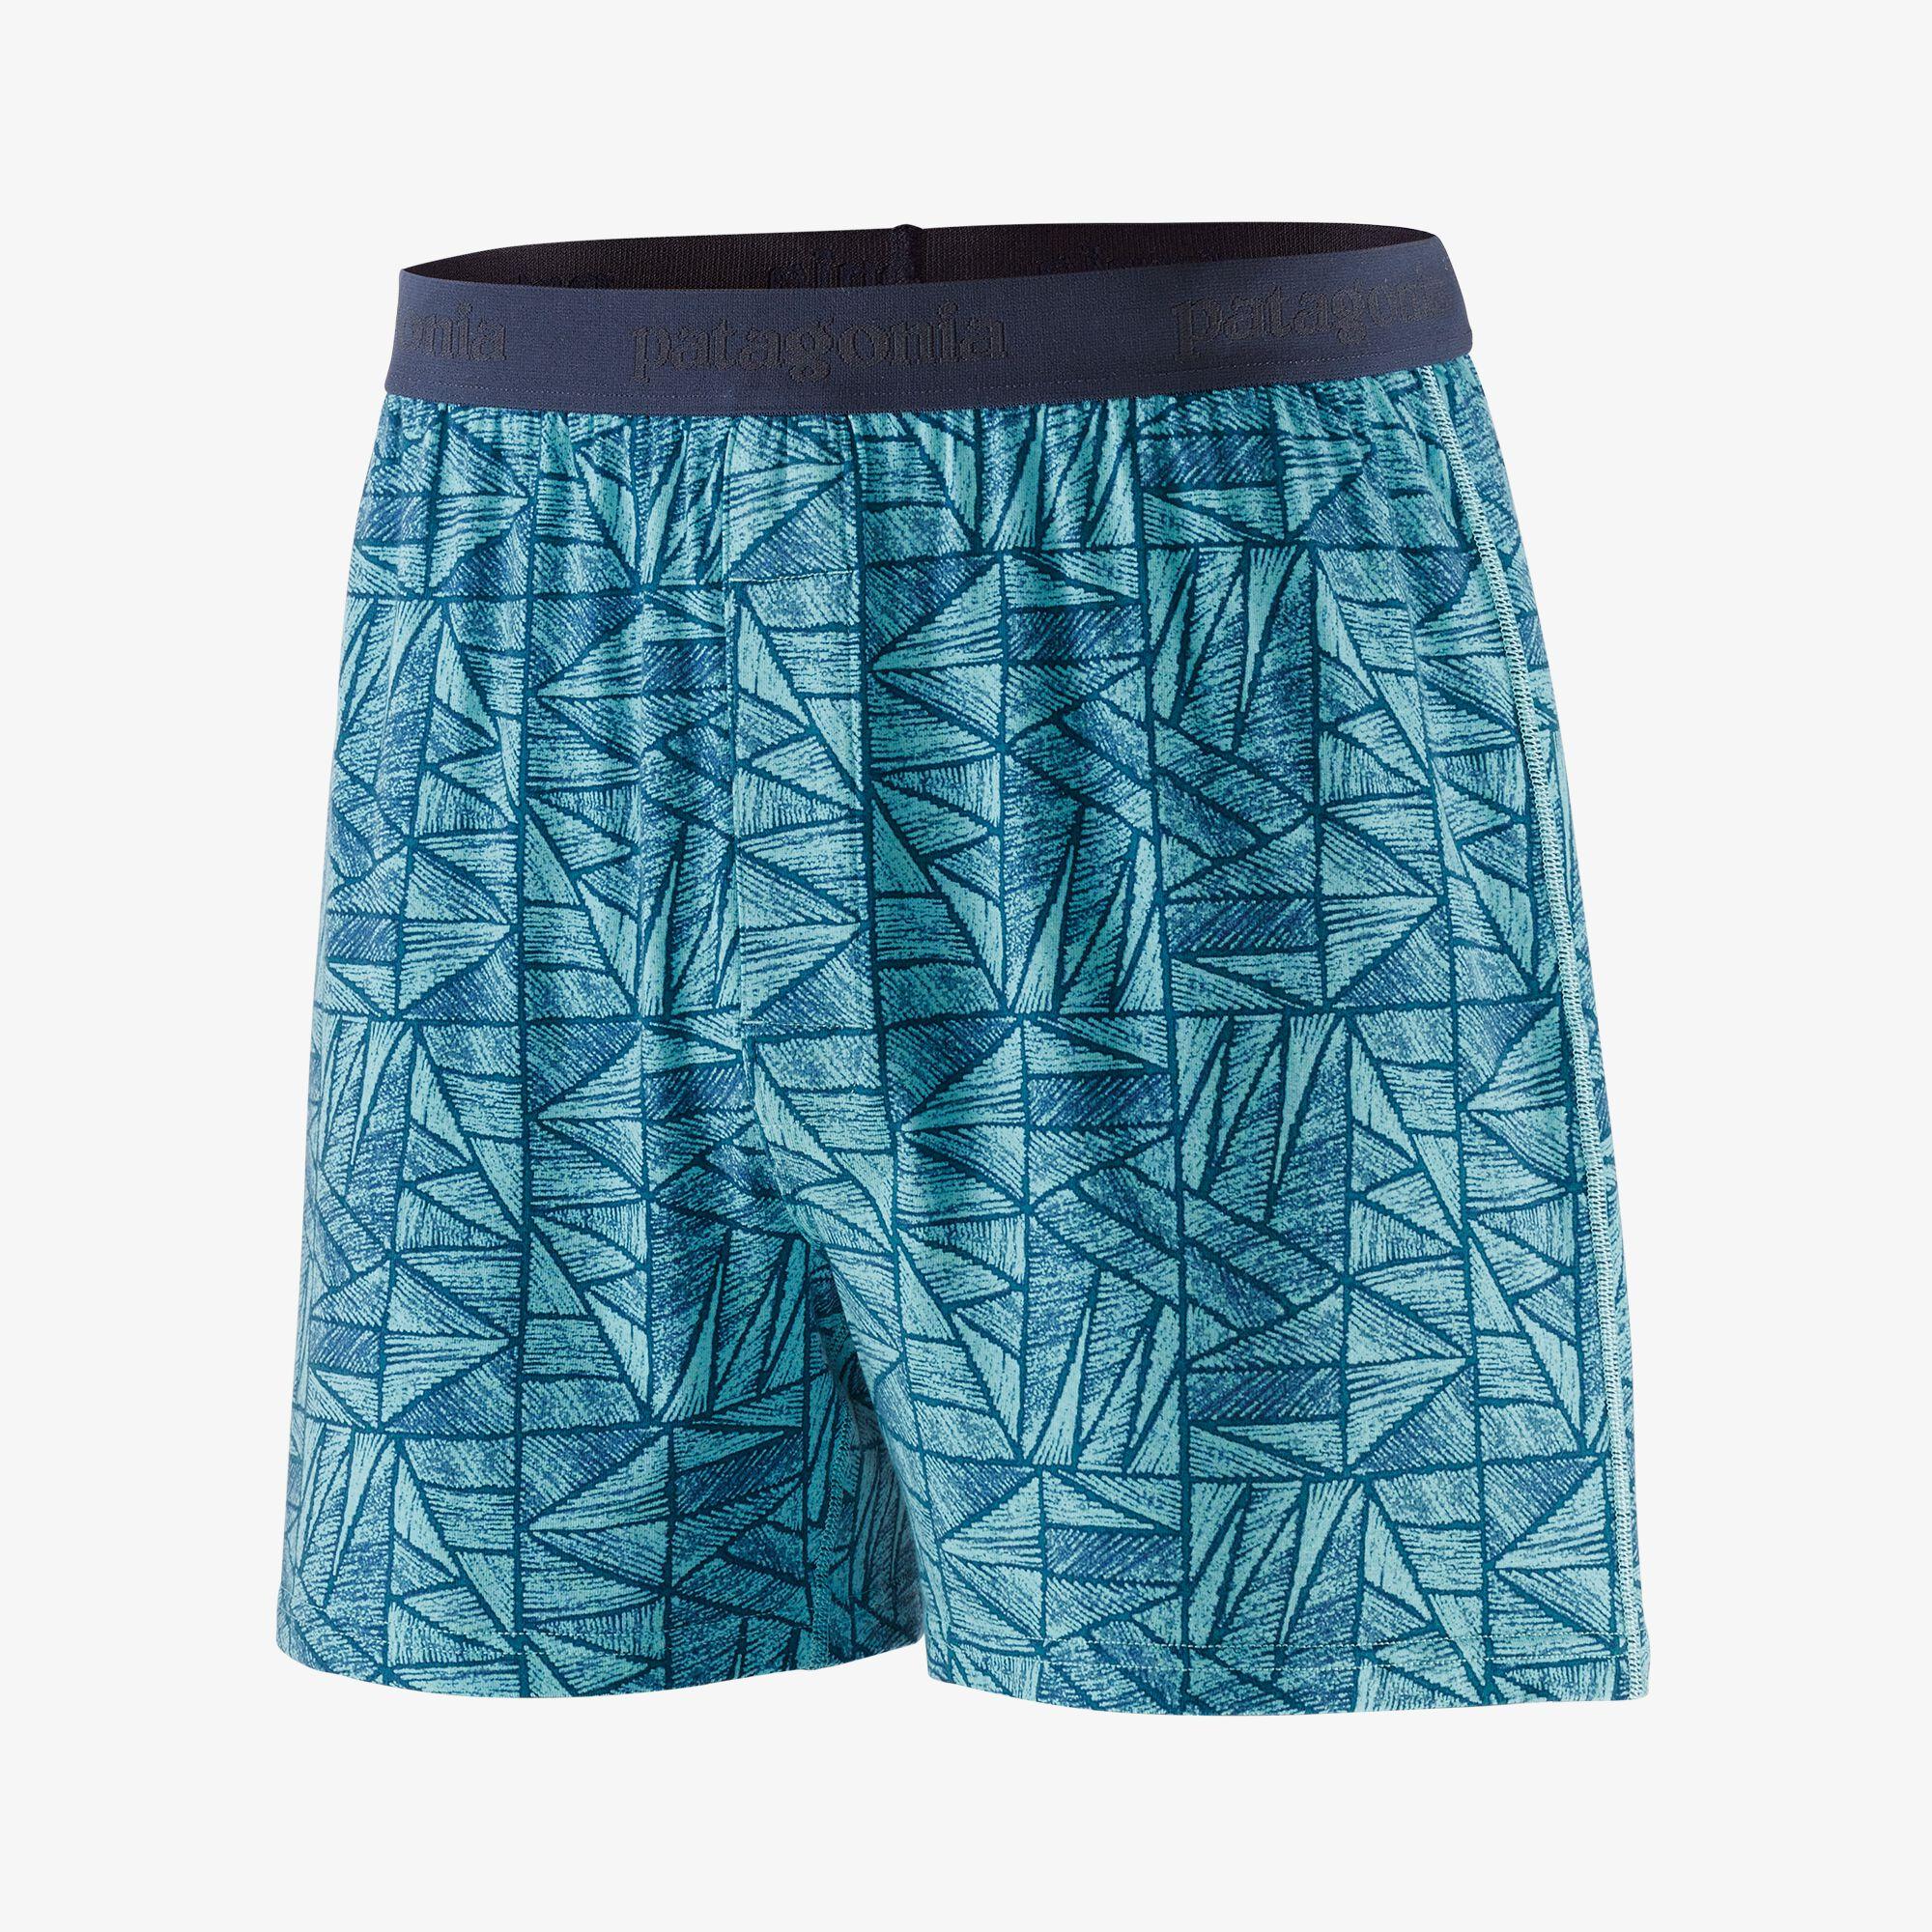 patagonia underwear